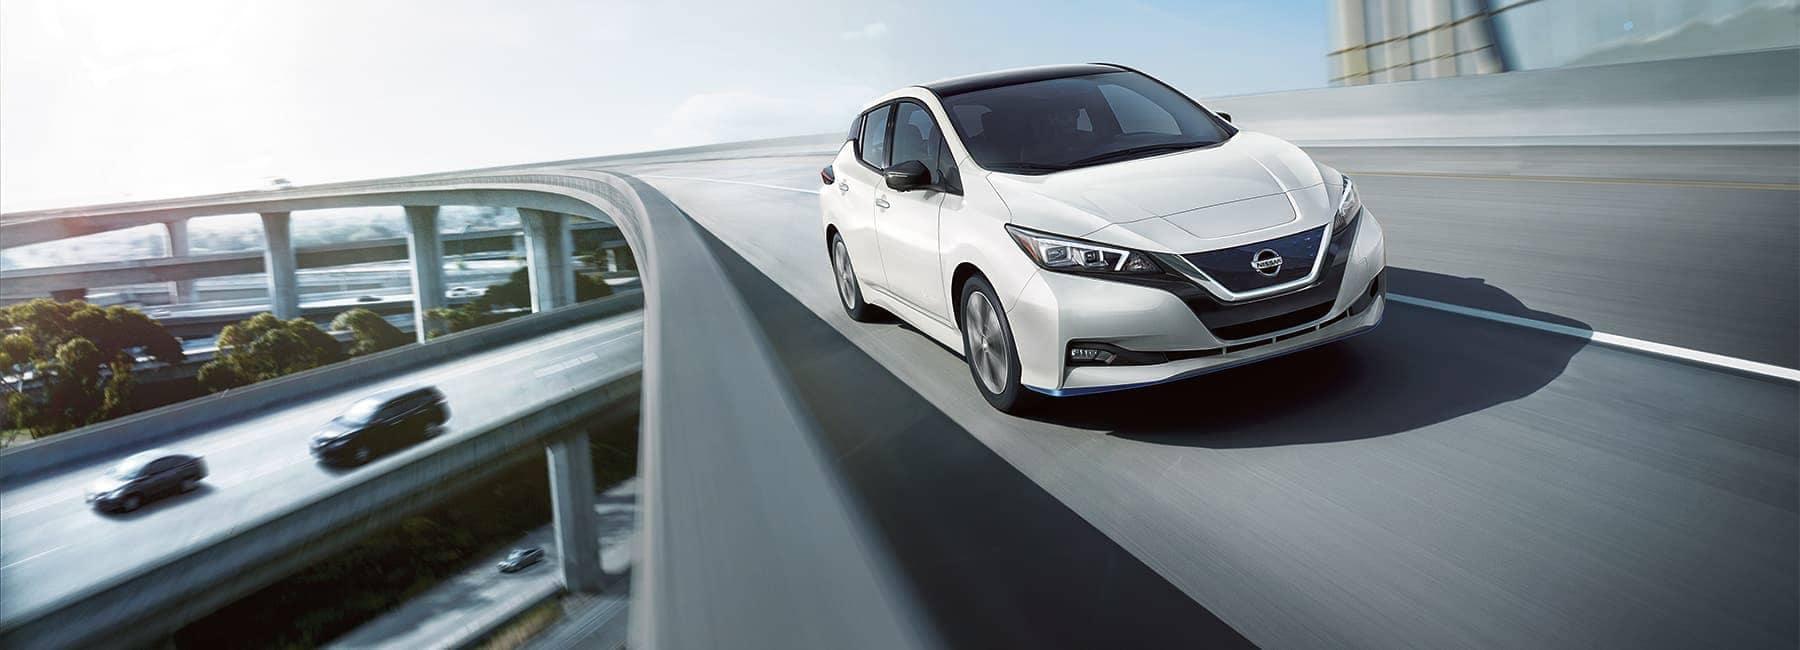 2020-nissan-leaf-exterior-driving-on-a-bridge